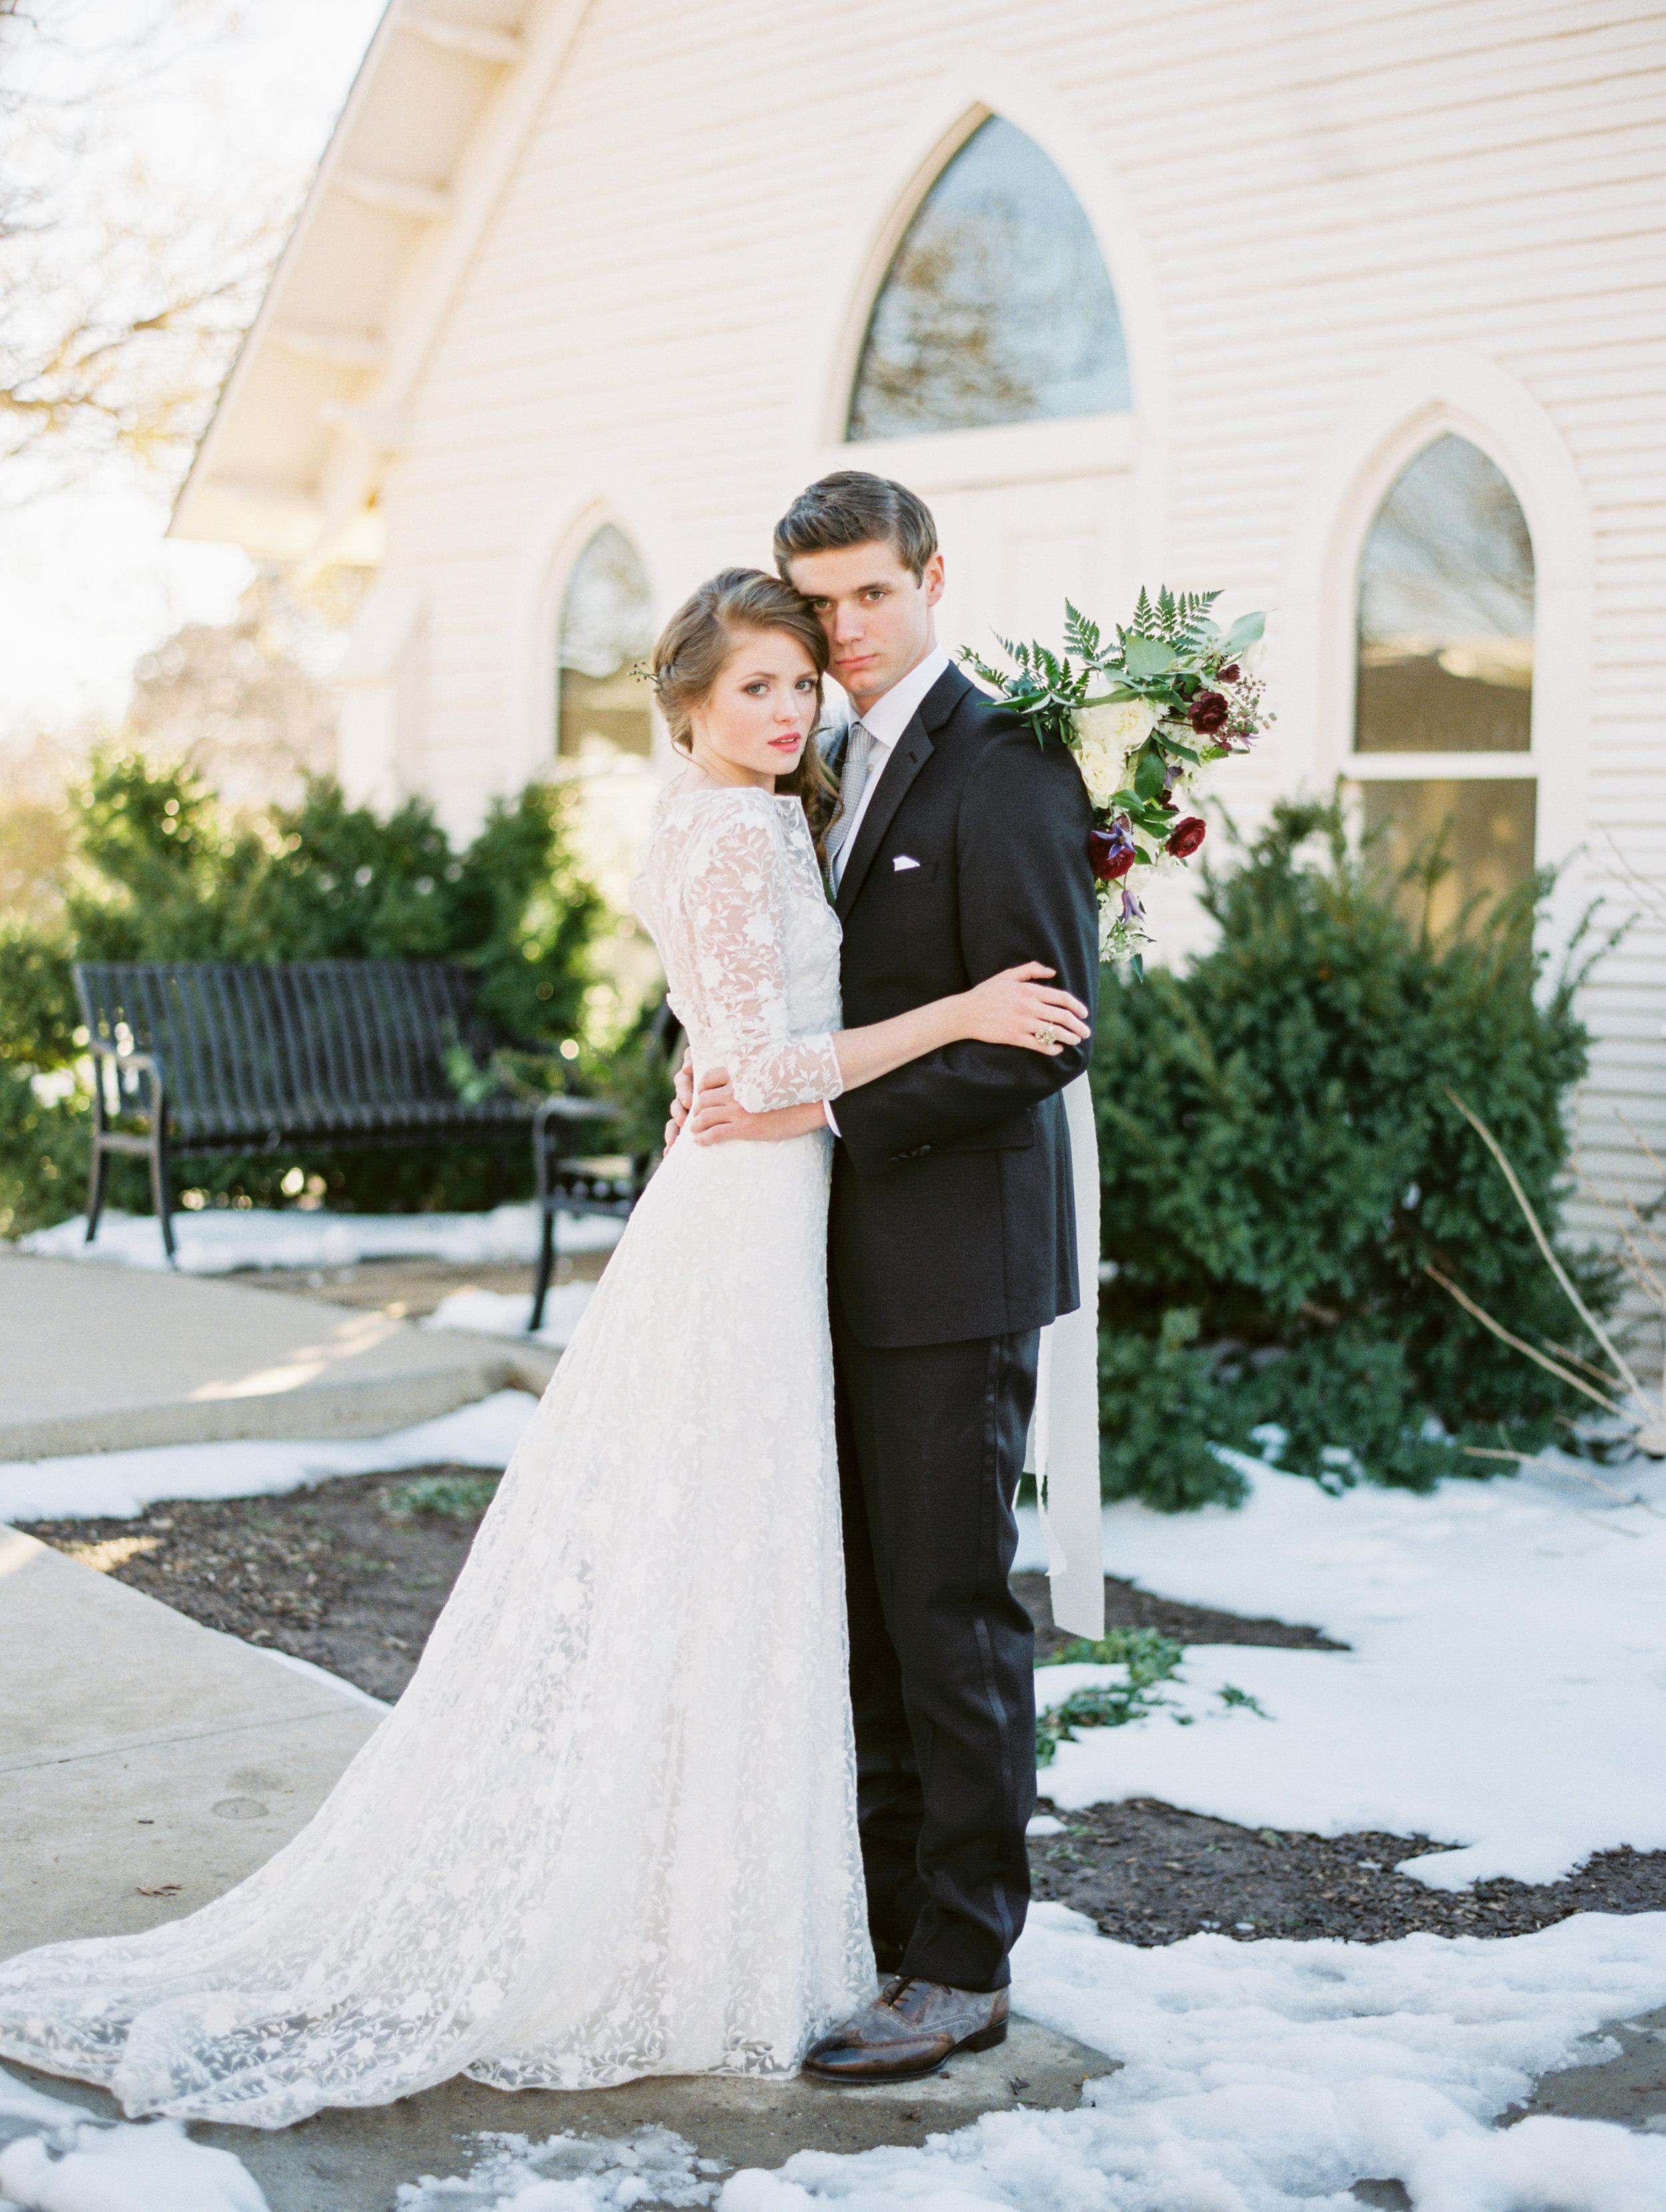 Lubbock Winter Wedding Inspiration_poster size_002.jpg